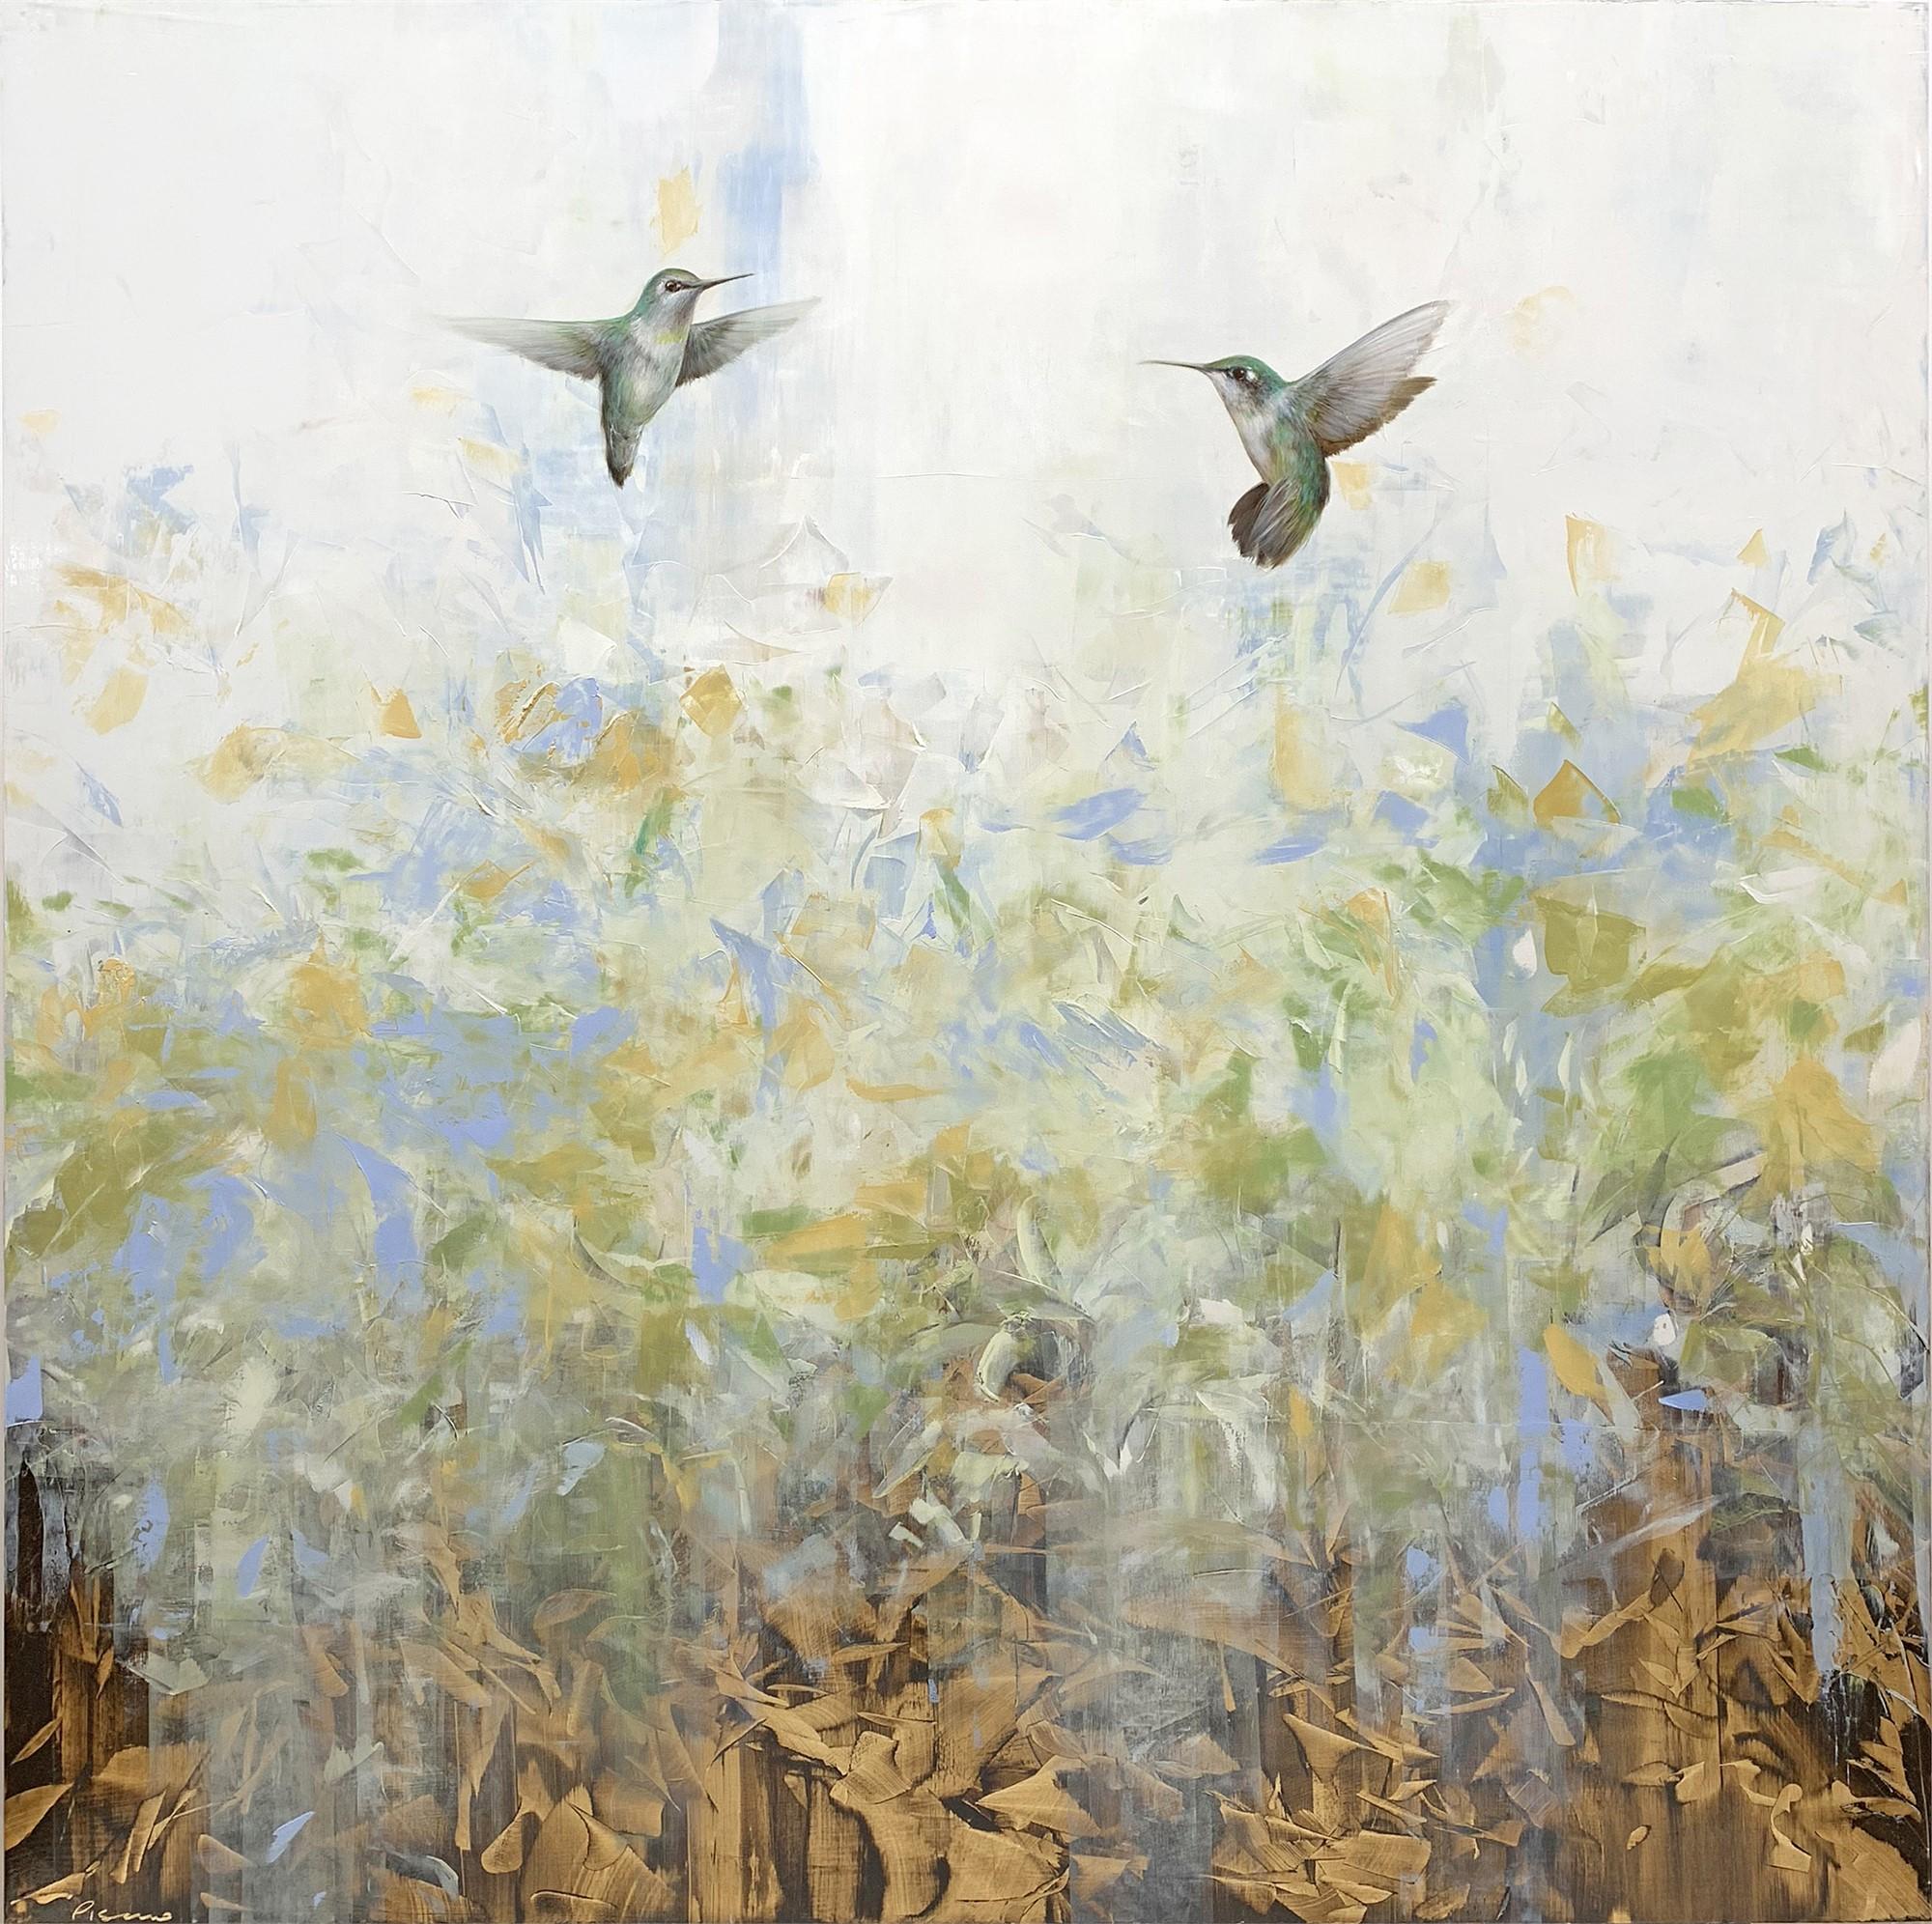 Jewel of the Sky by Jessica Pisano